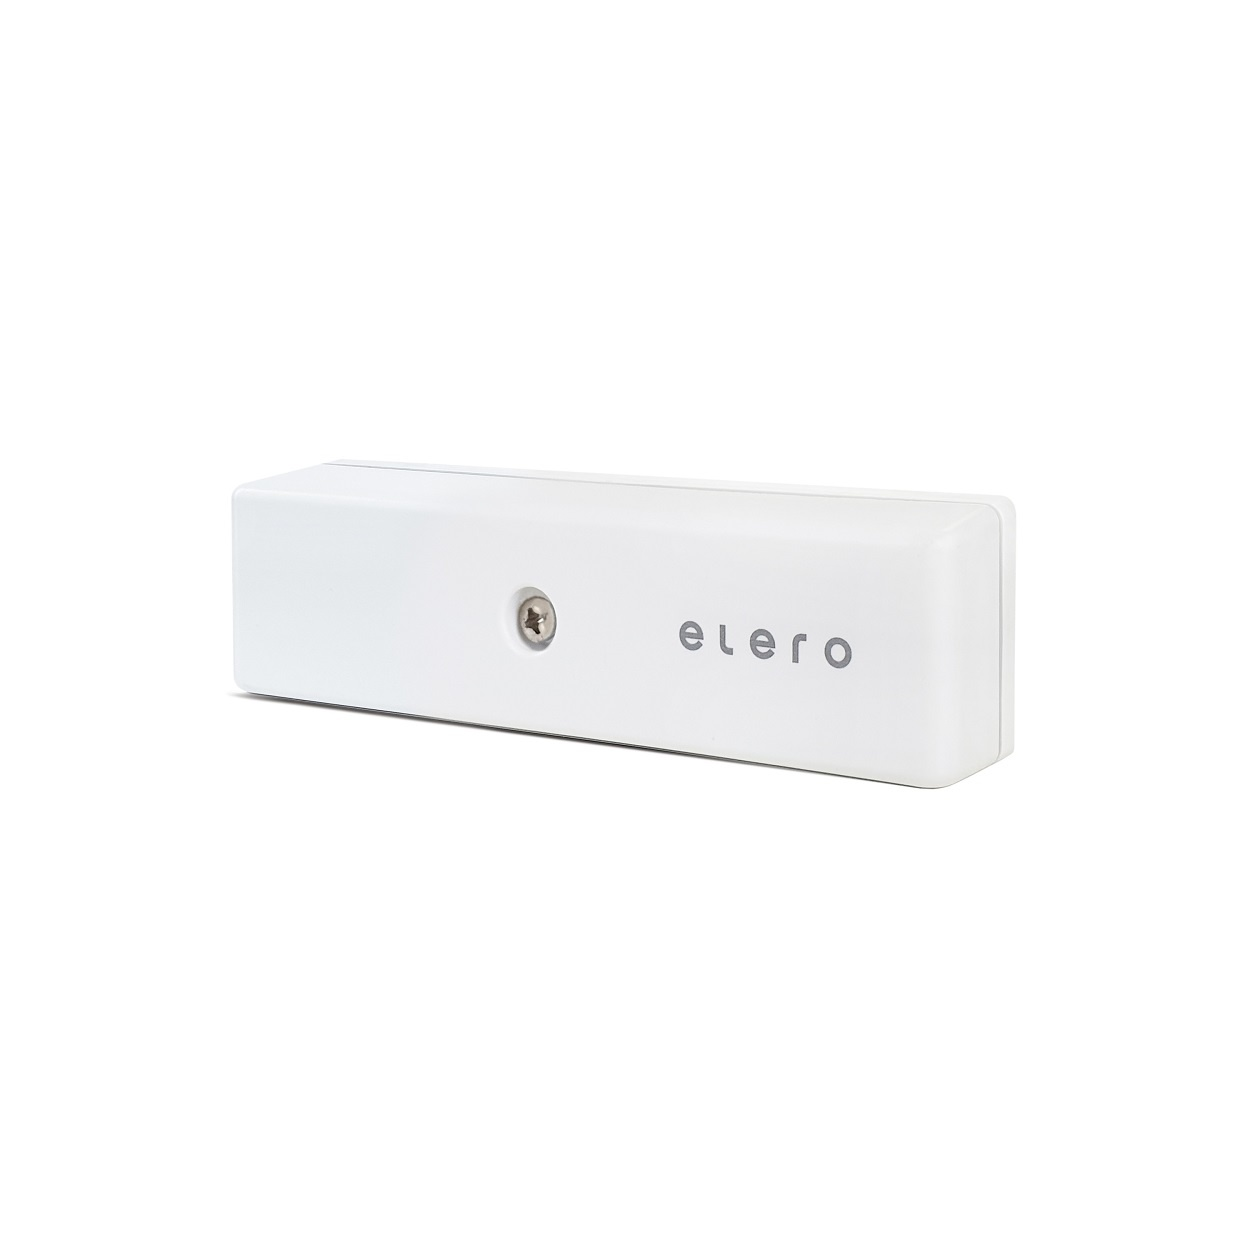 Elero Protero 868 bi-directionele bewegings/wind sensor